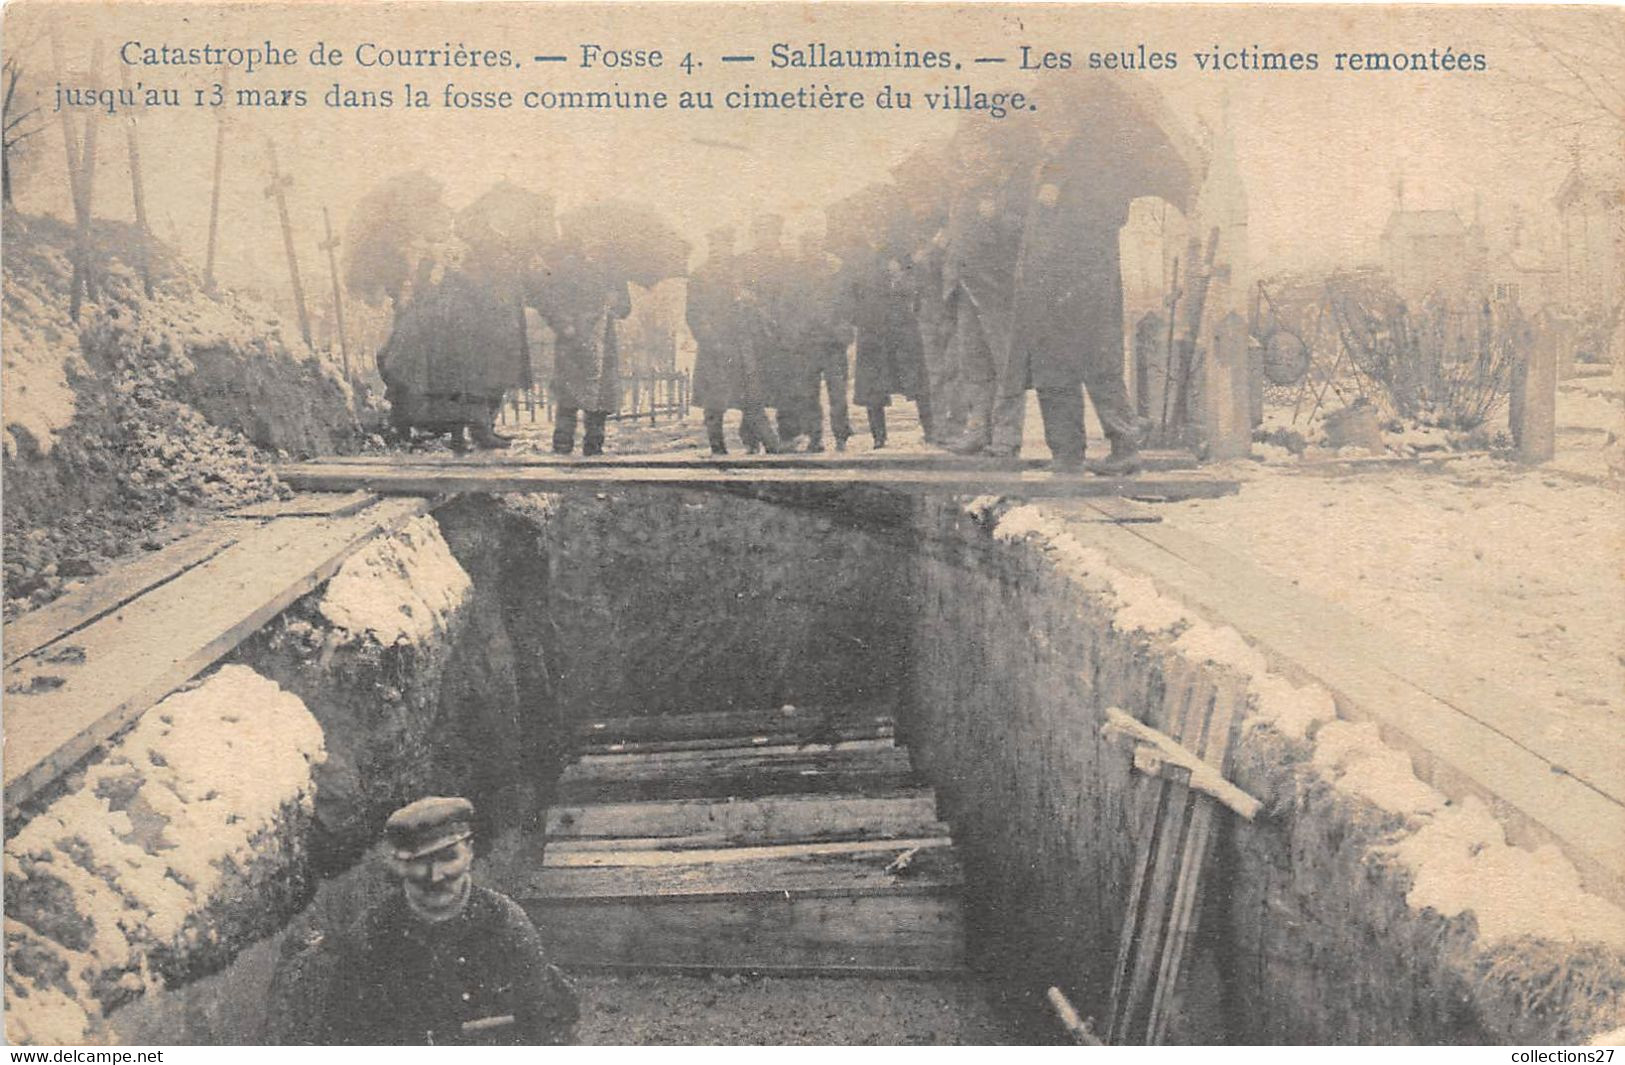 62-COURRIERES-CATASTROPHE DE COURRIERES, FOSSE 4- SALLAUMINES- LES SEULES VICTIMES REMONTEES ... - Andere Gemeenten